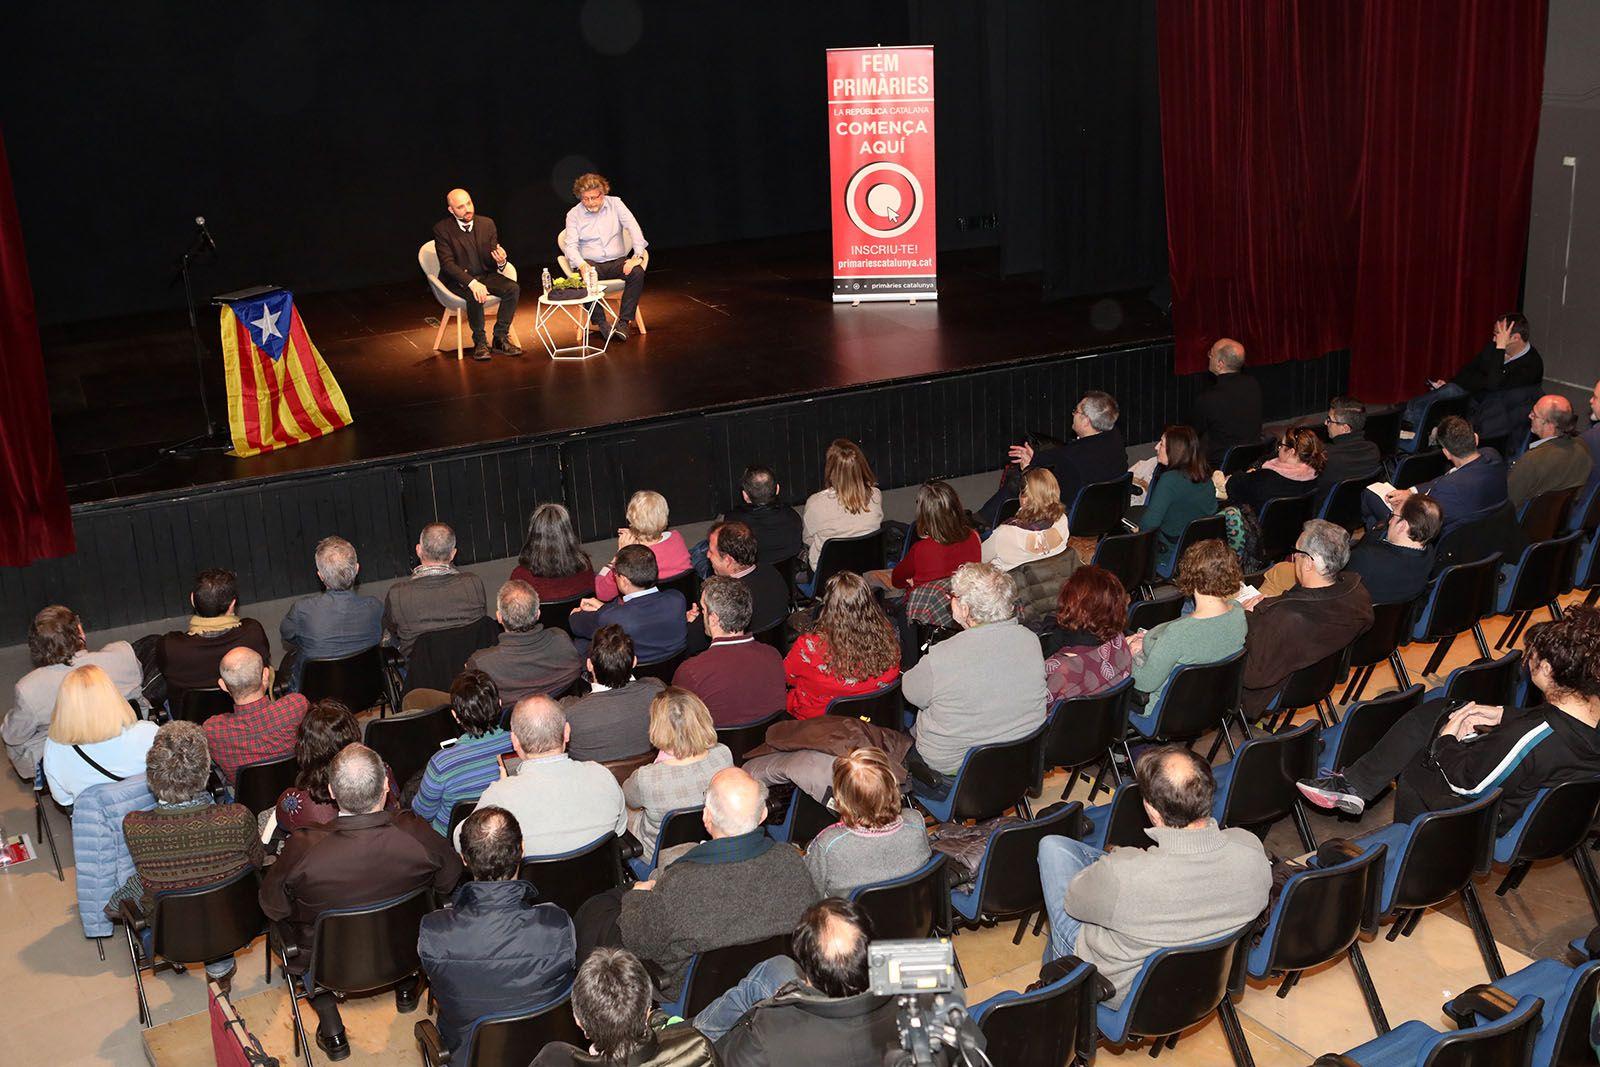 Acte de Primàries Sant Cugat, amb Jordi Graupera i Antoni Castellà. Foto: Lali Álvarez